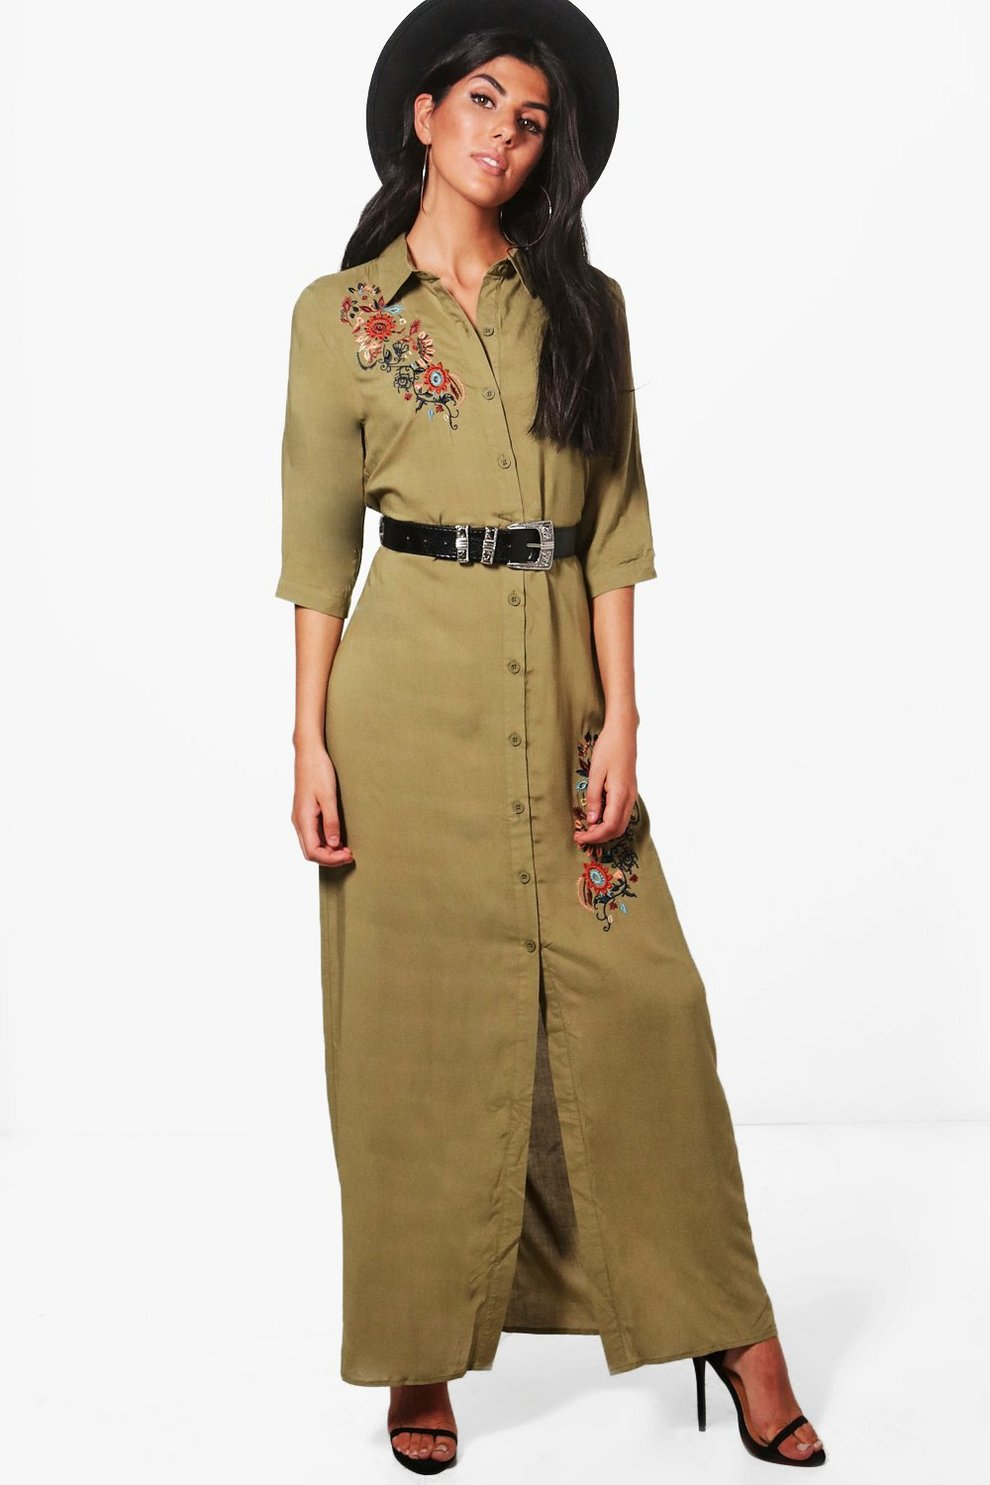 326e5cf0e5af Lucie Embroidered Maxi Shirt Dress | Boohoo